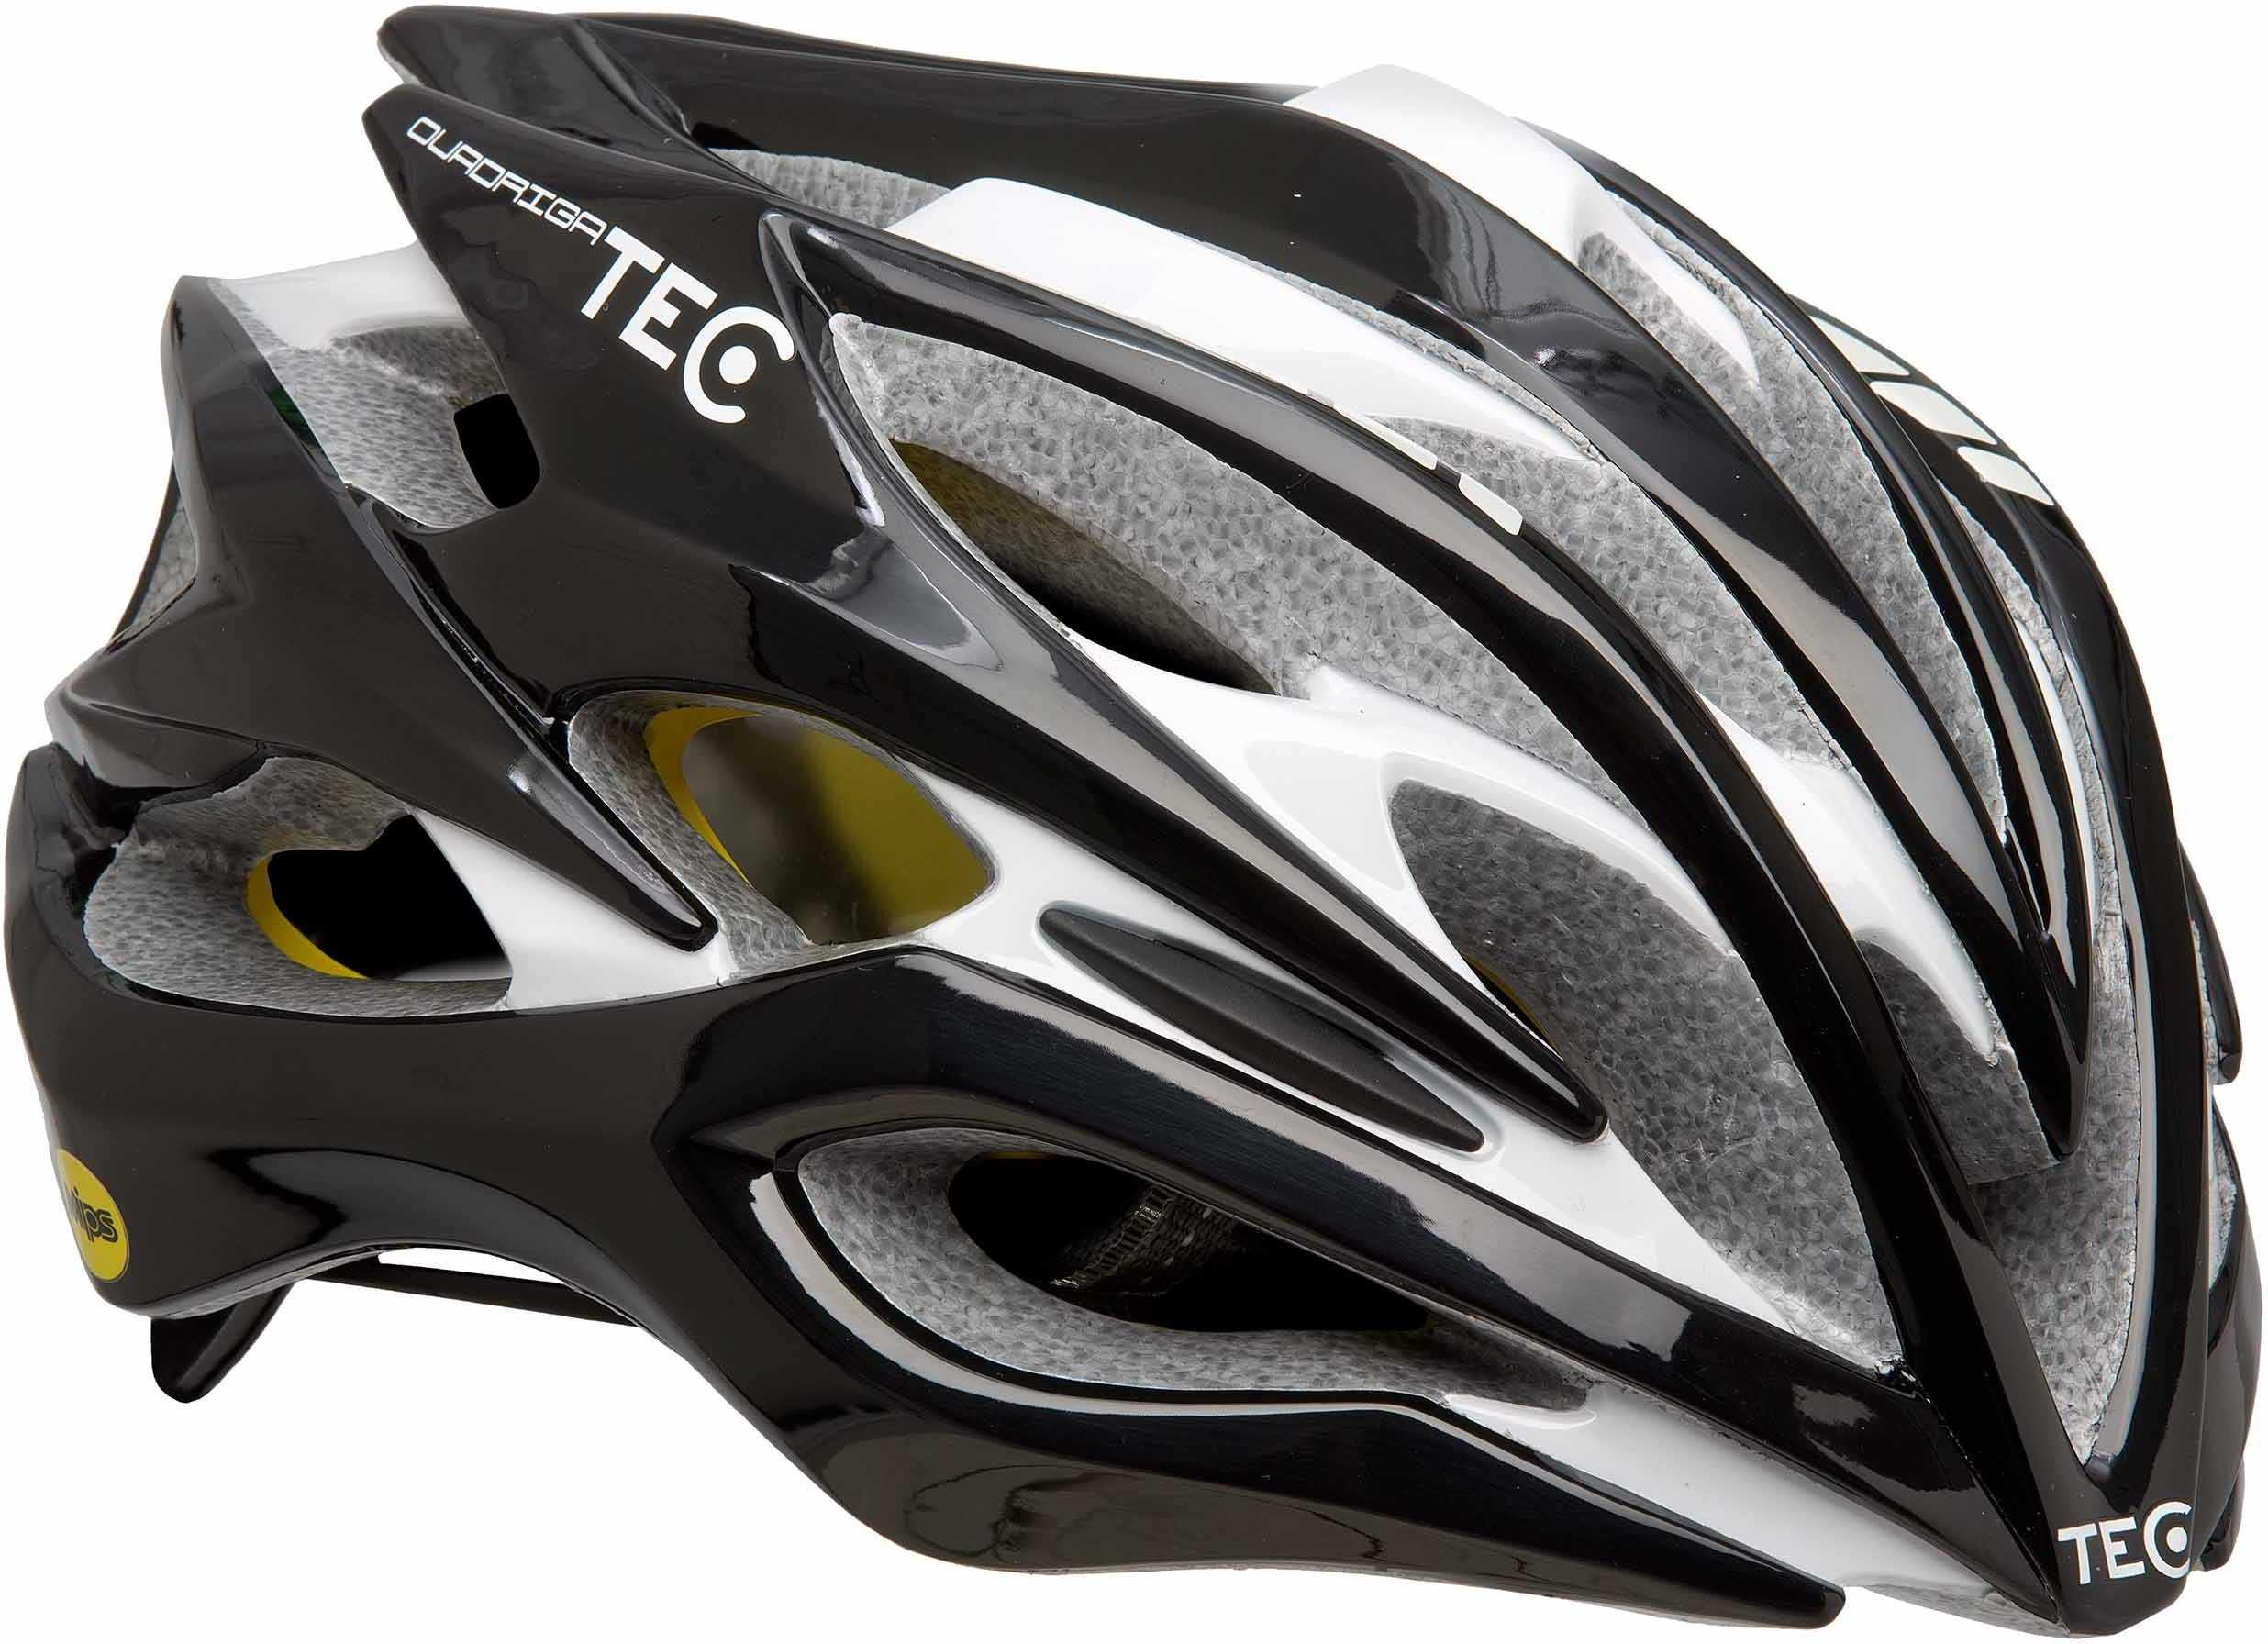 Hjelm TEC Quadriga EV1 sort | Hjelme